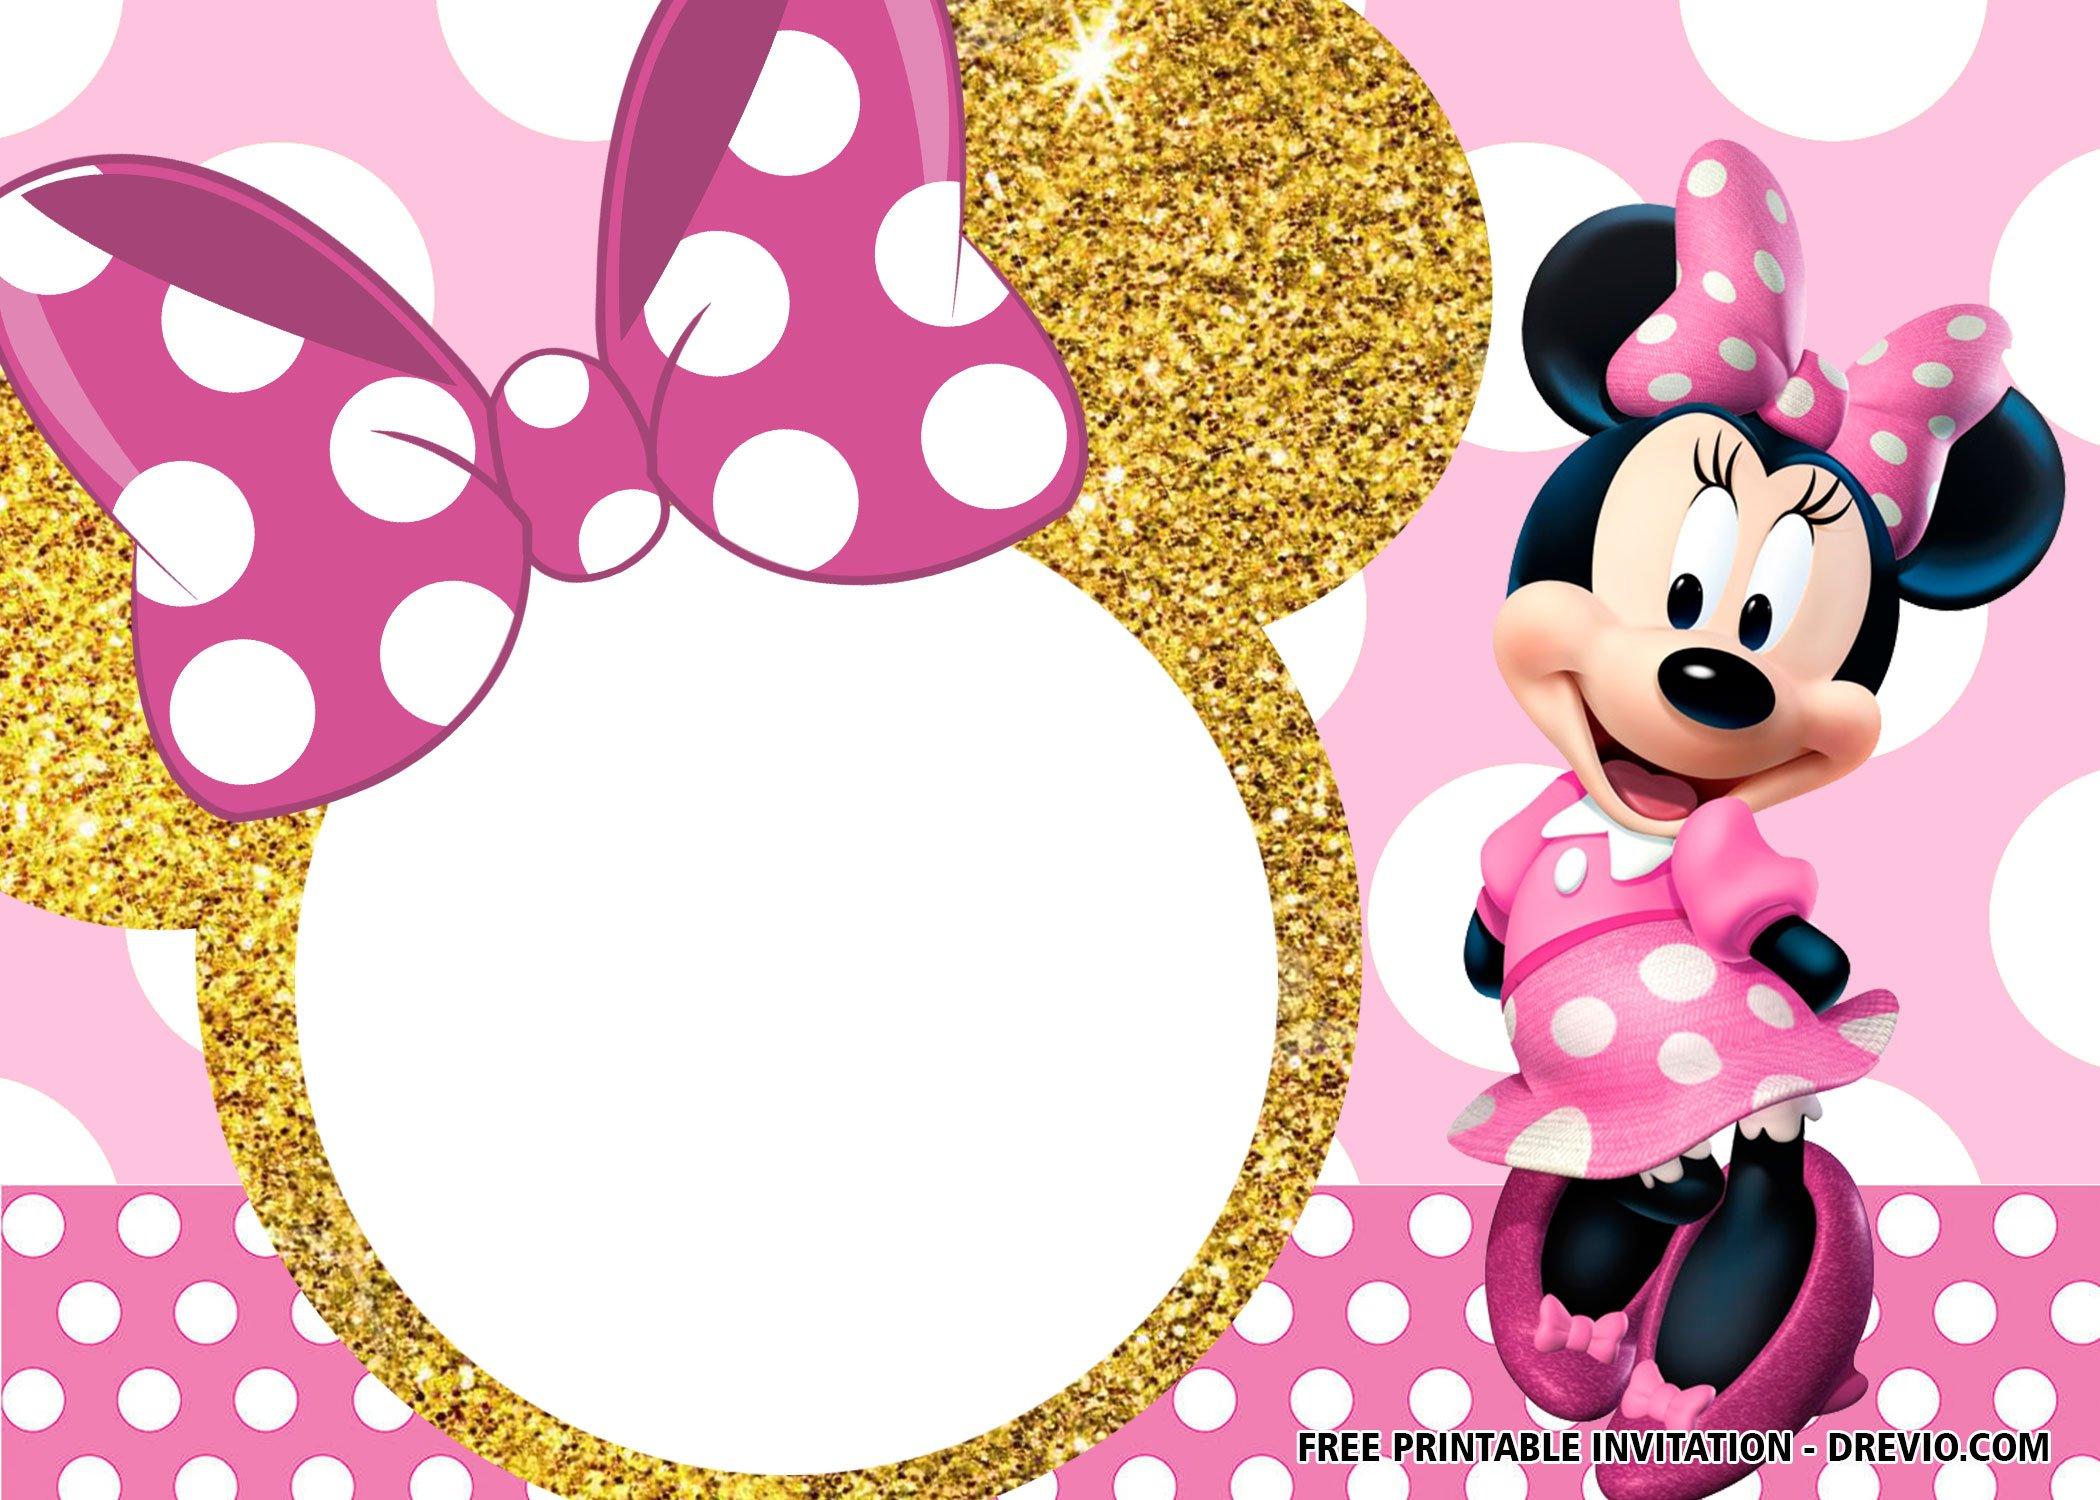 30 Free Printable Minnie Mouse Birthday Invitation Templates Download Hundreds Free Printable Birthday Invitation Templates